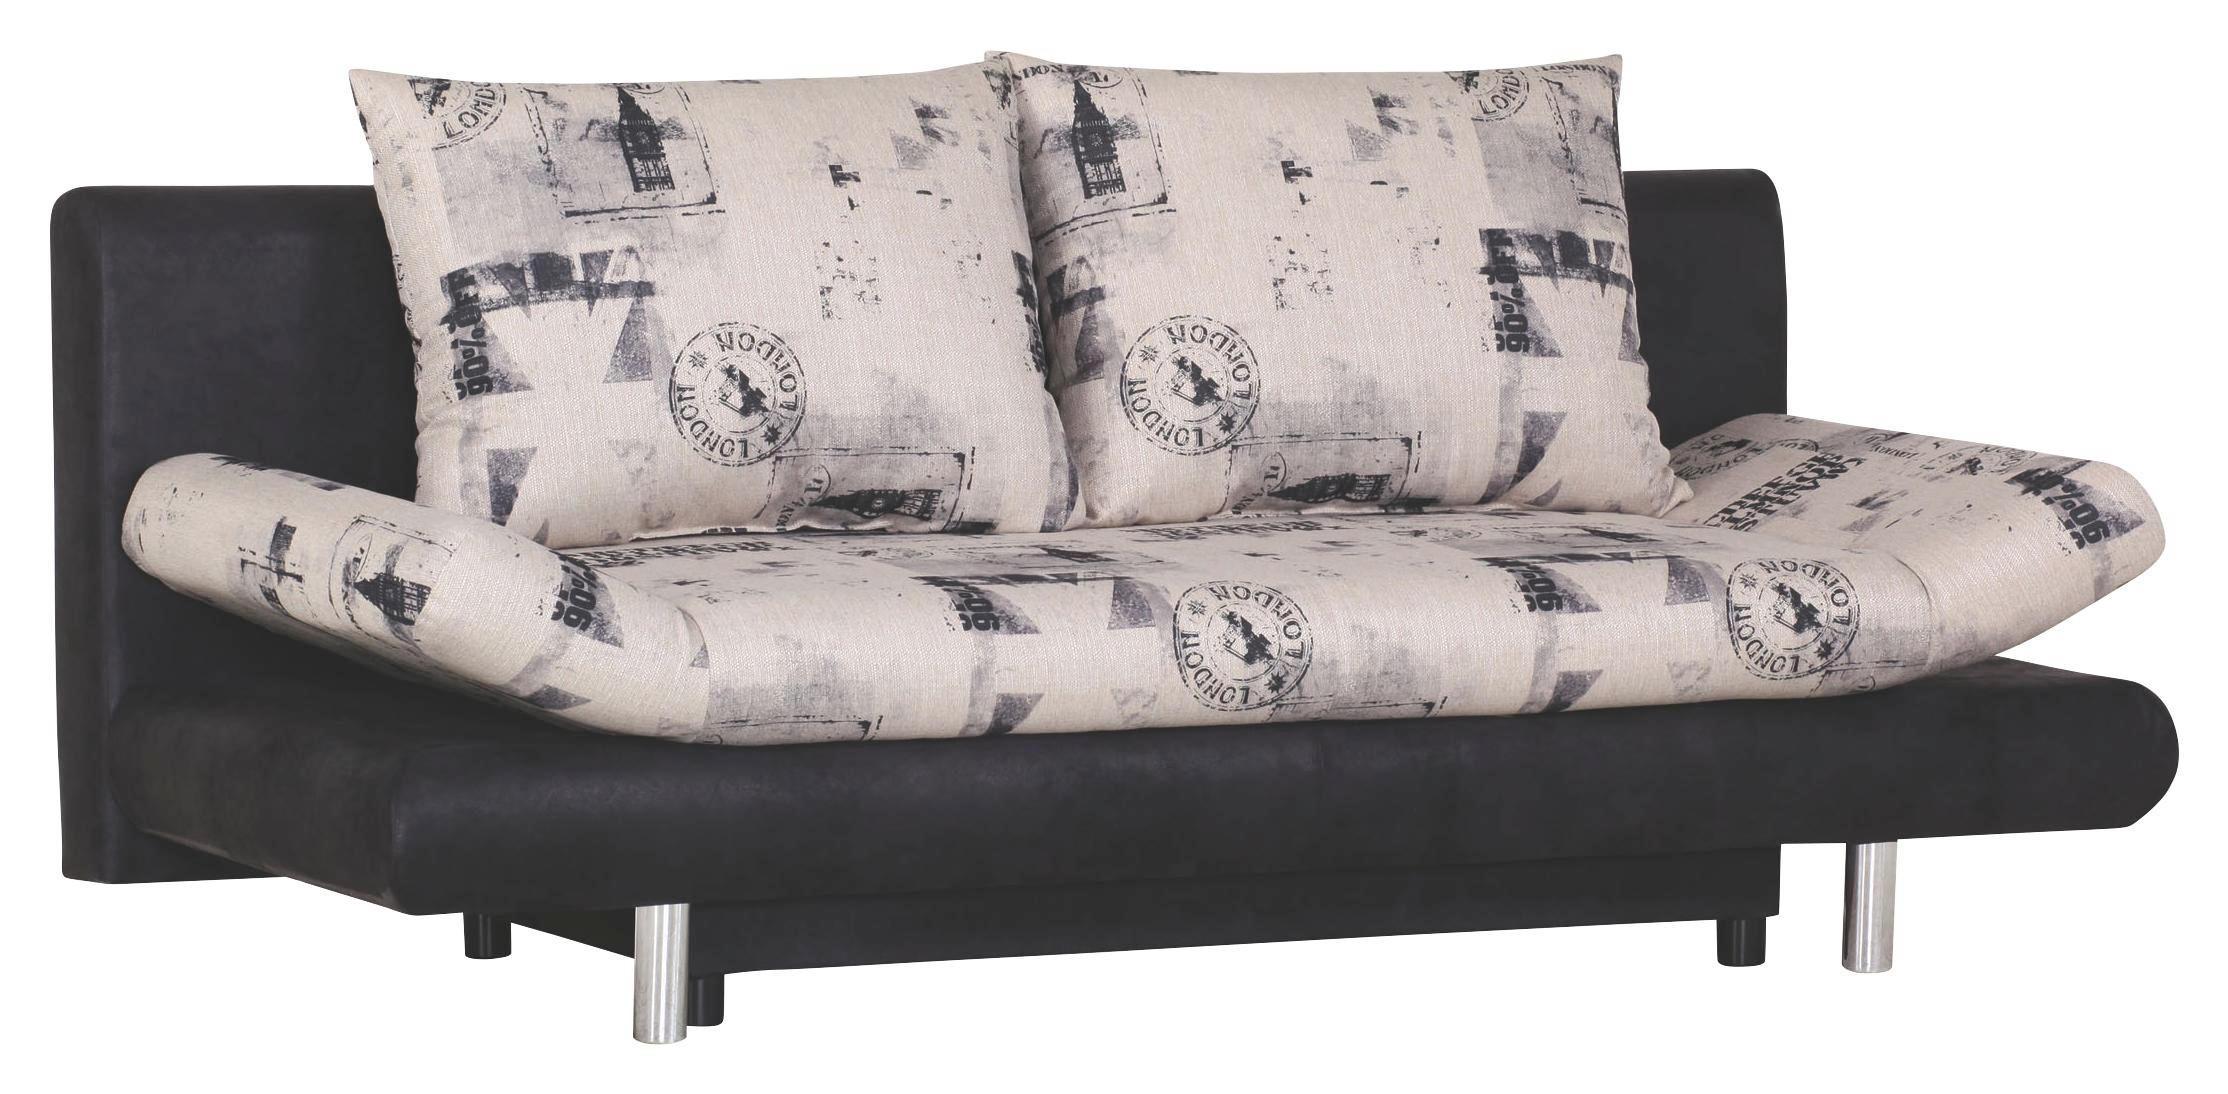 SCHLAFSOFA in Grau Textil - Chromfarben/Grau, Design, Kunststoff/Textil (194/73/91cm) - CARRYHOME